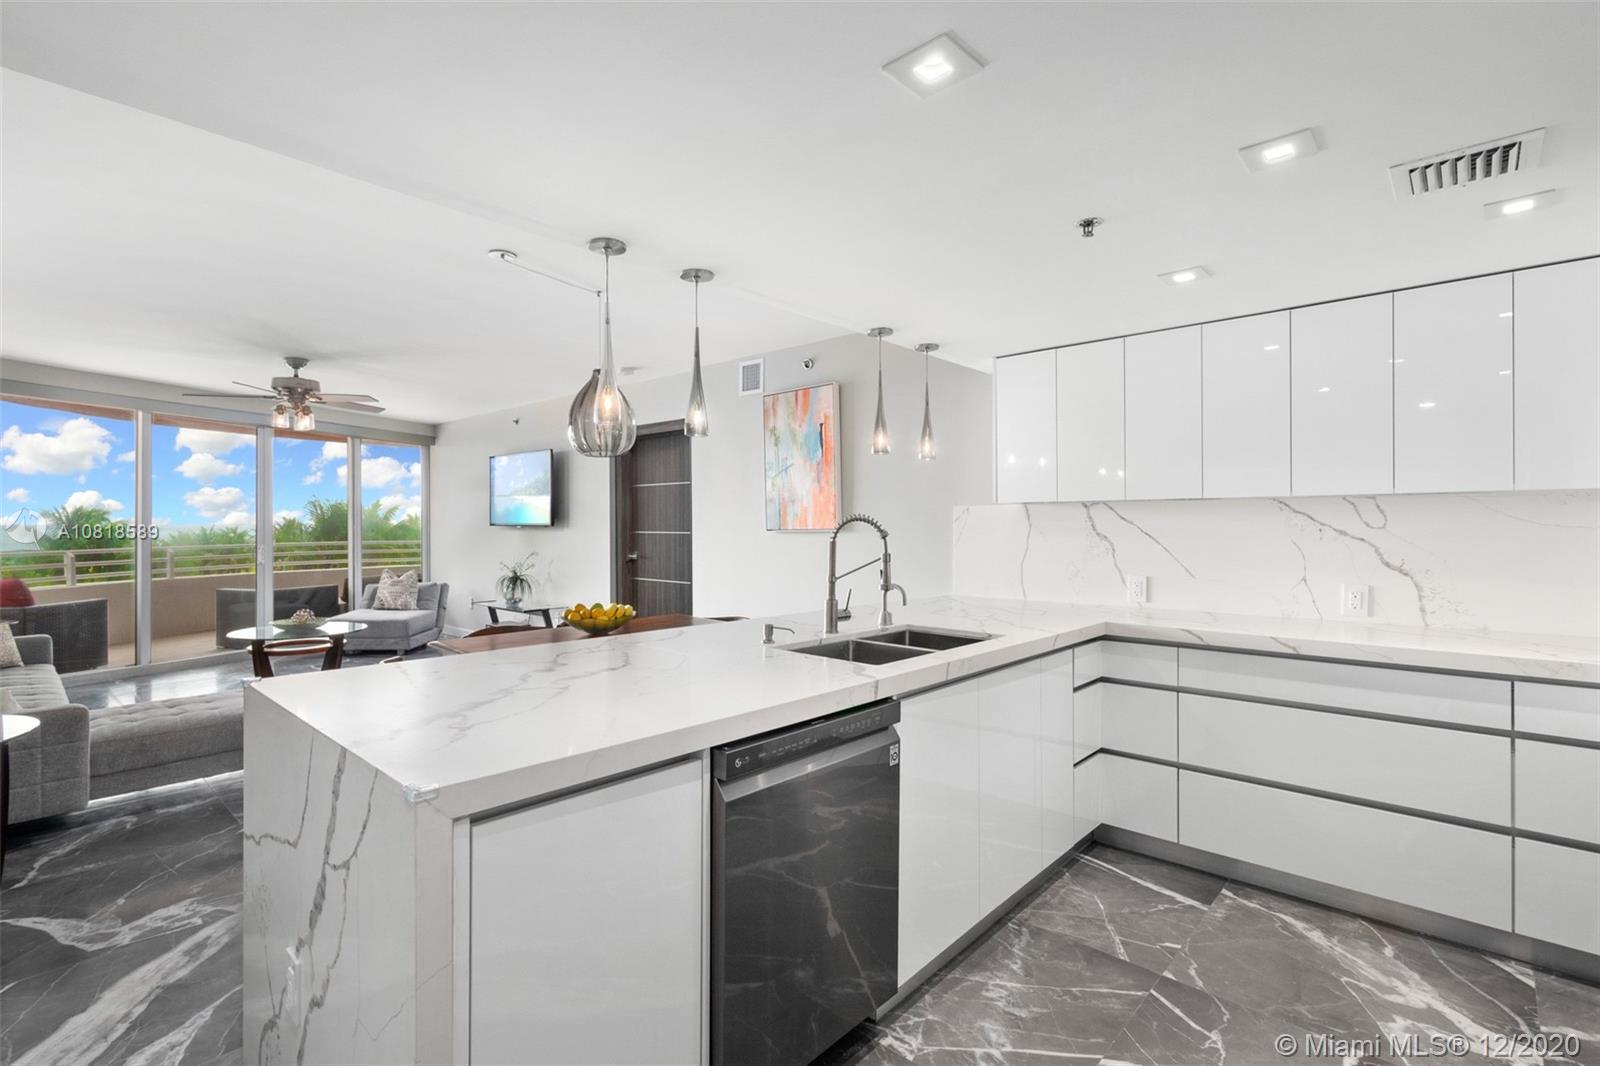 226 Ocean Dr # 4B, Miami Beach, Florida 33139, 2 Bedrooms Bedrooms, ,2 BathroomsBathrooms,Residential,For Sale,226 Ocean Dr # 4B,A10818589